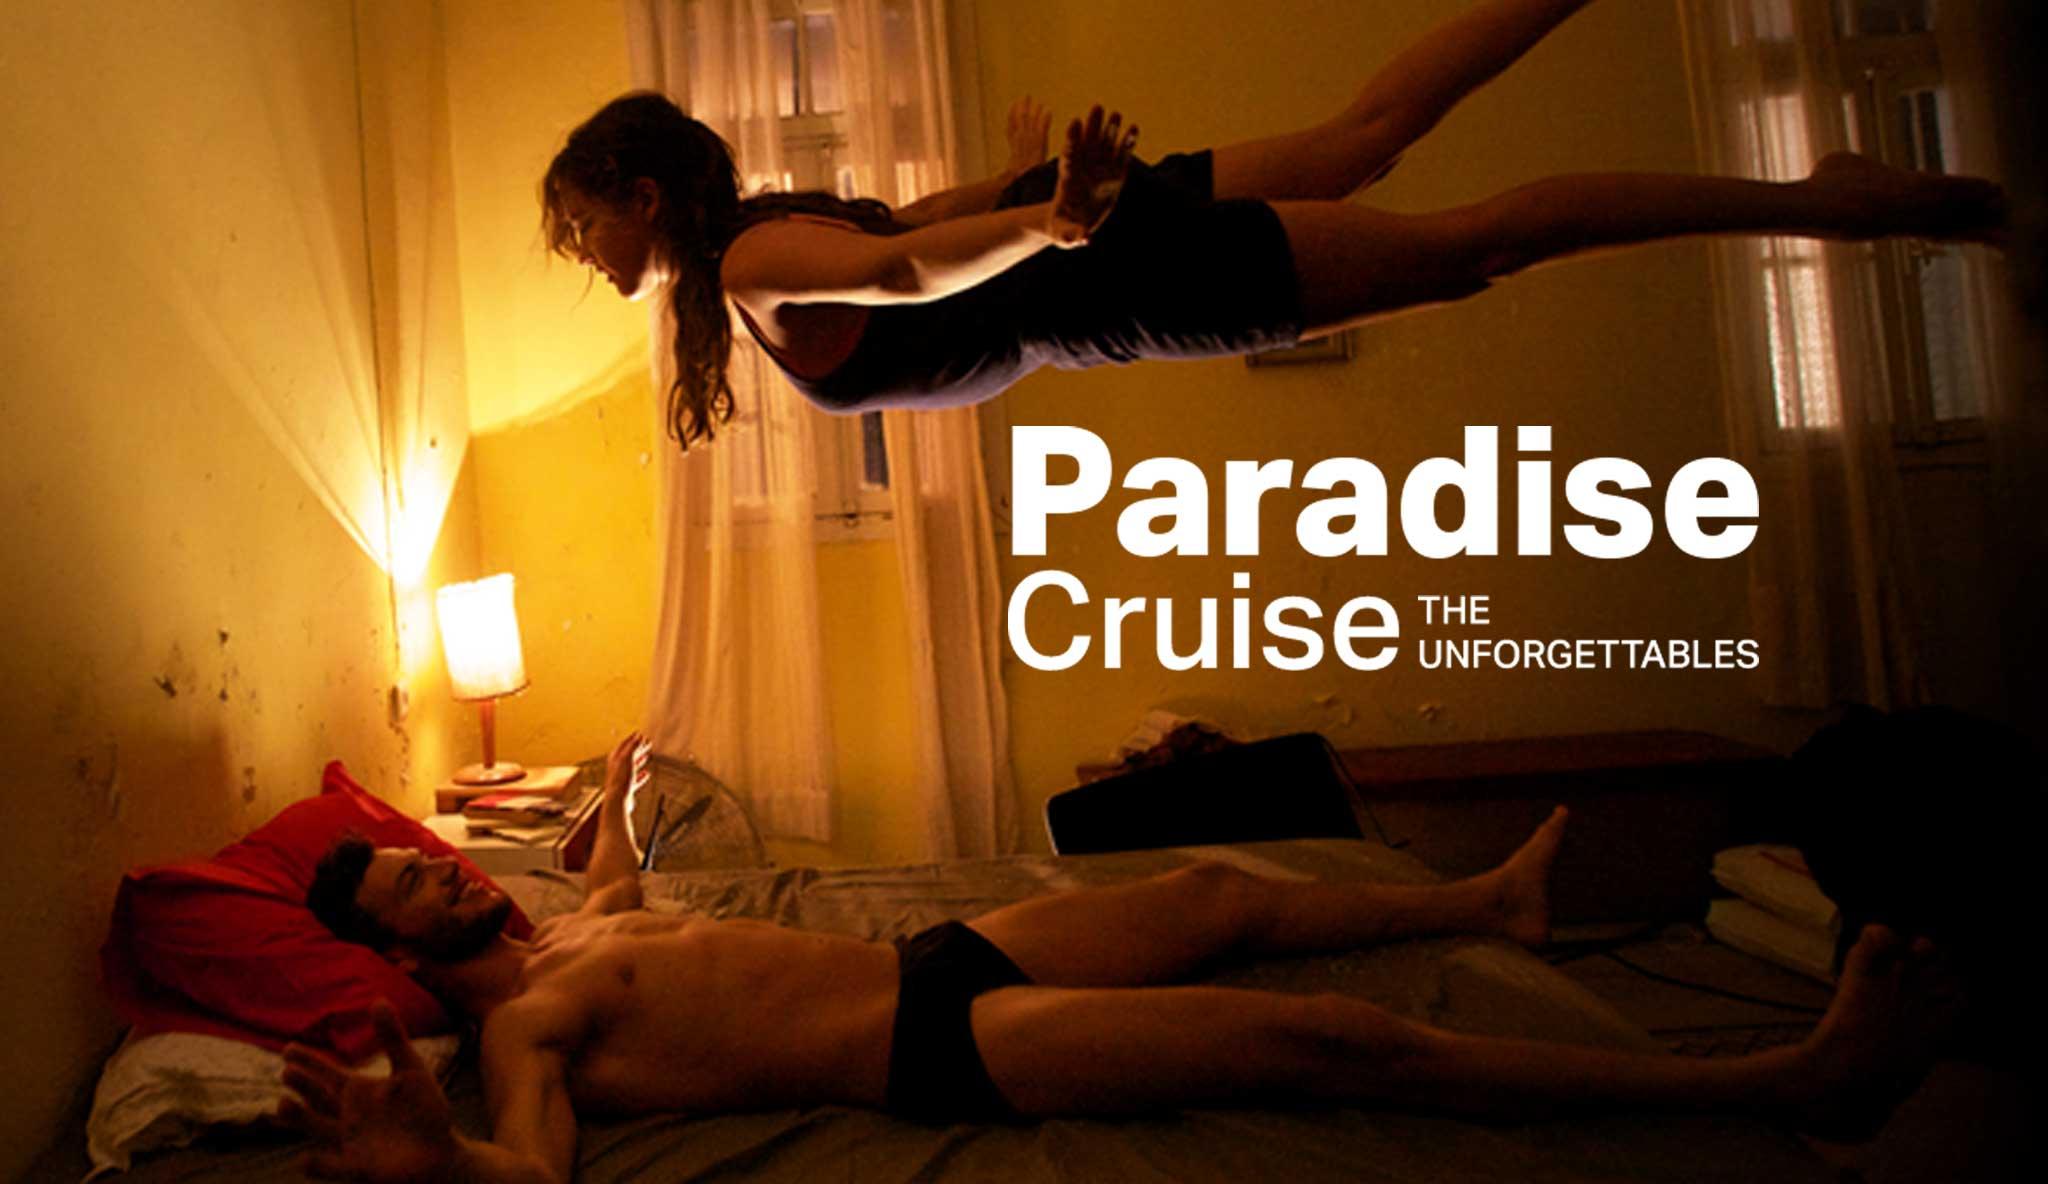 paradise-cruise-the-unforgettables\header.jpg